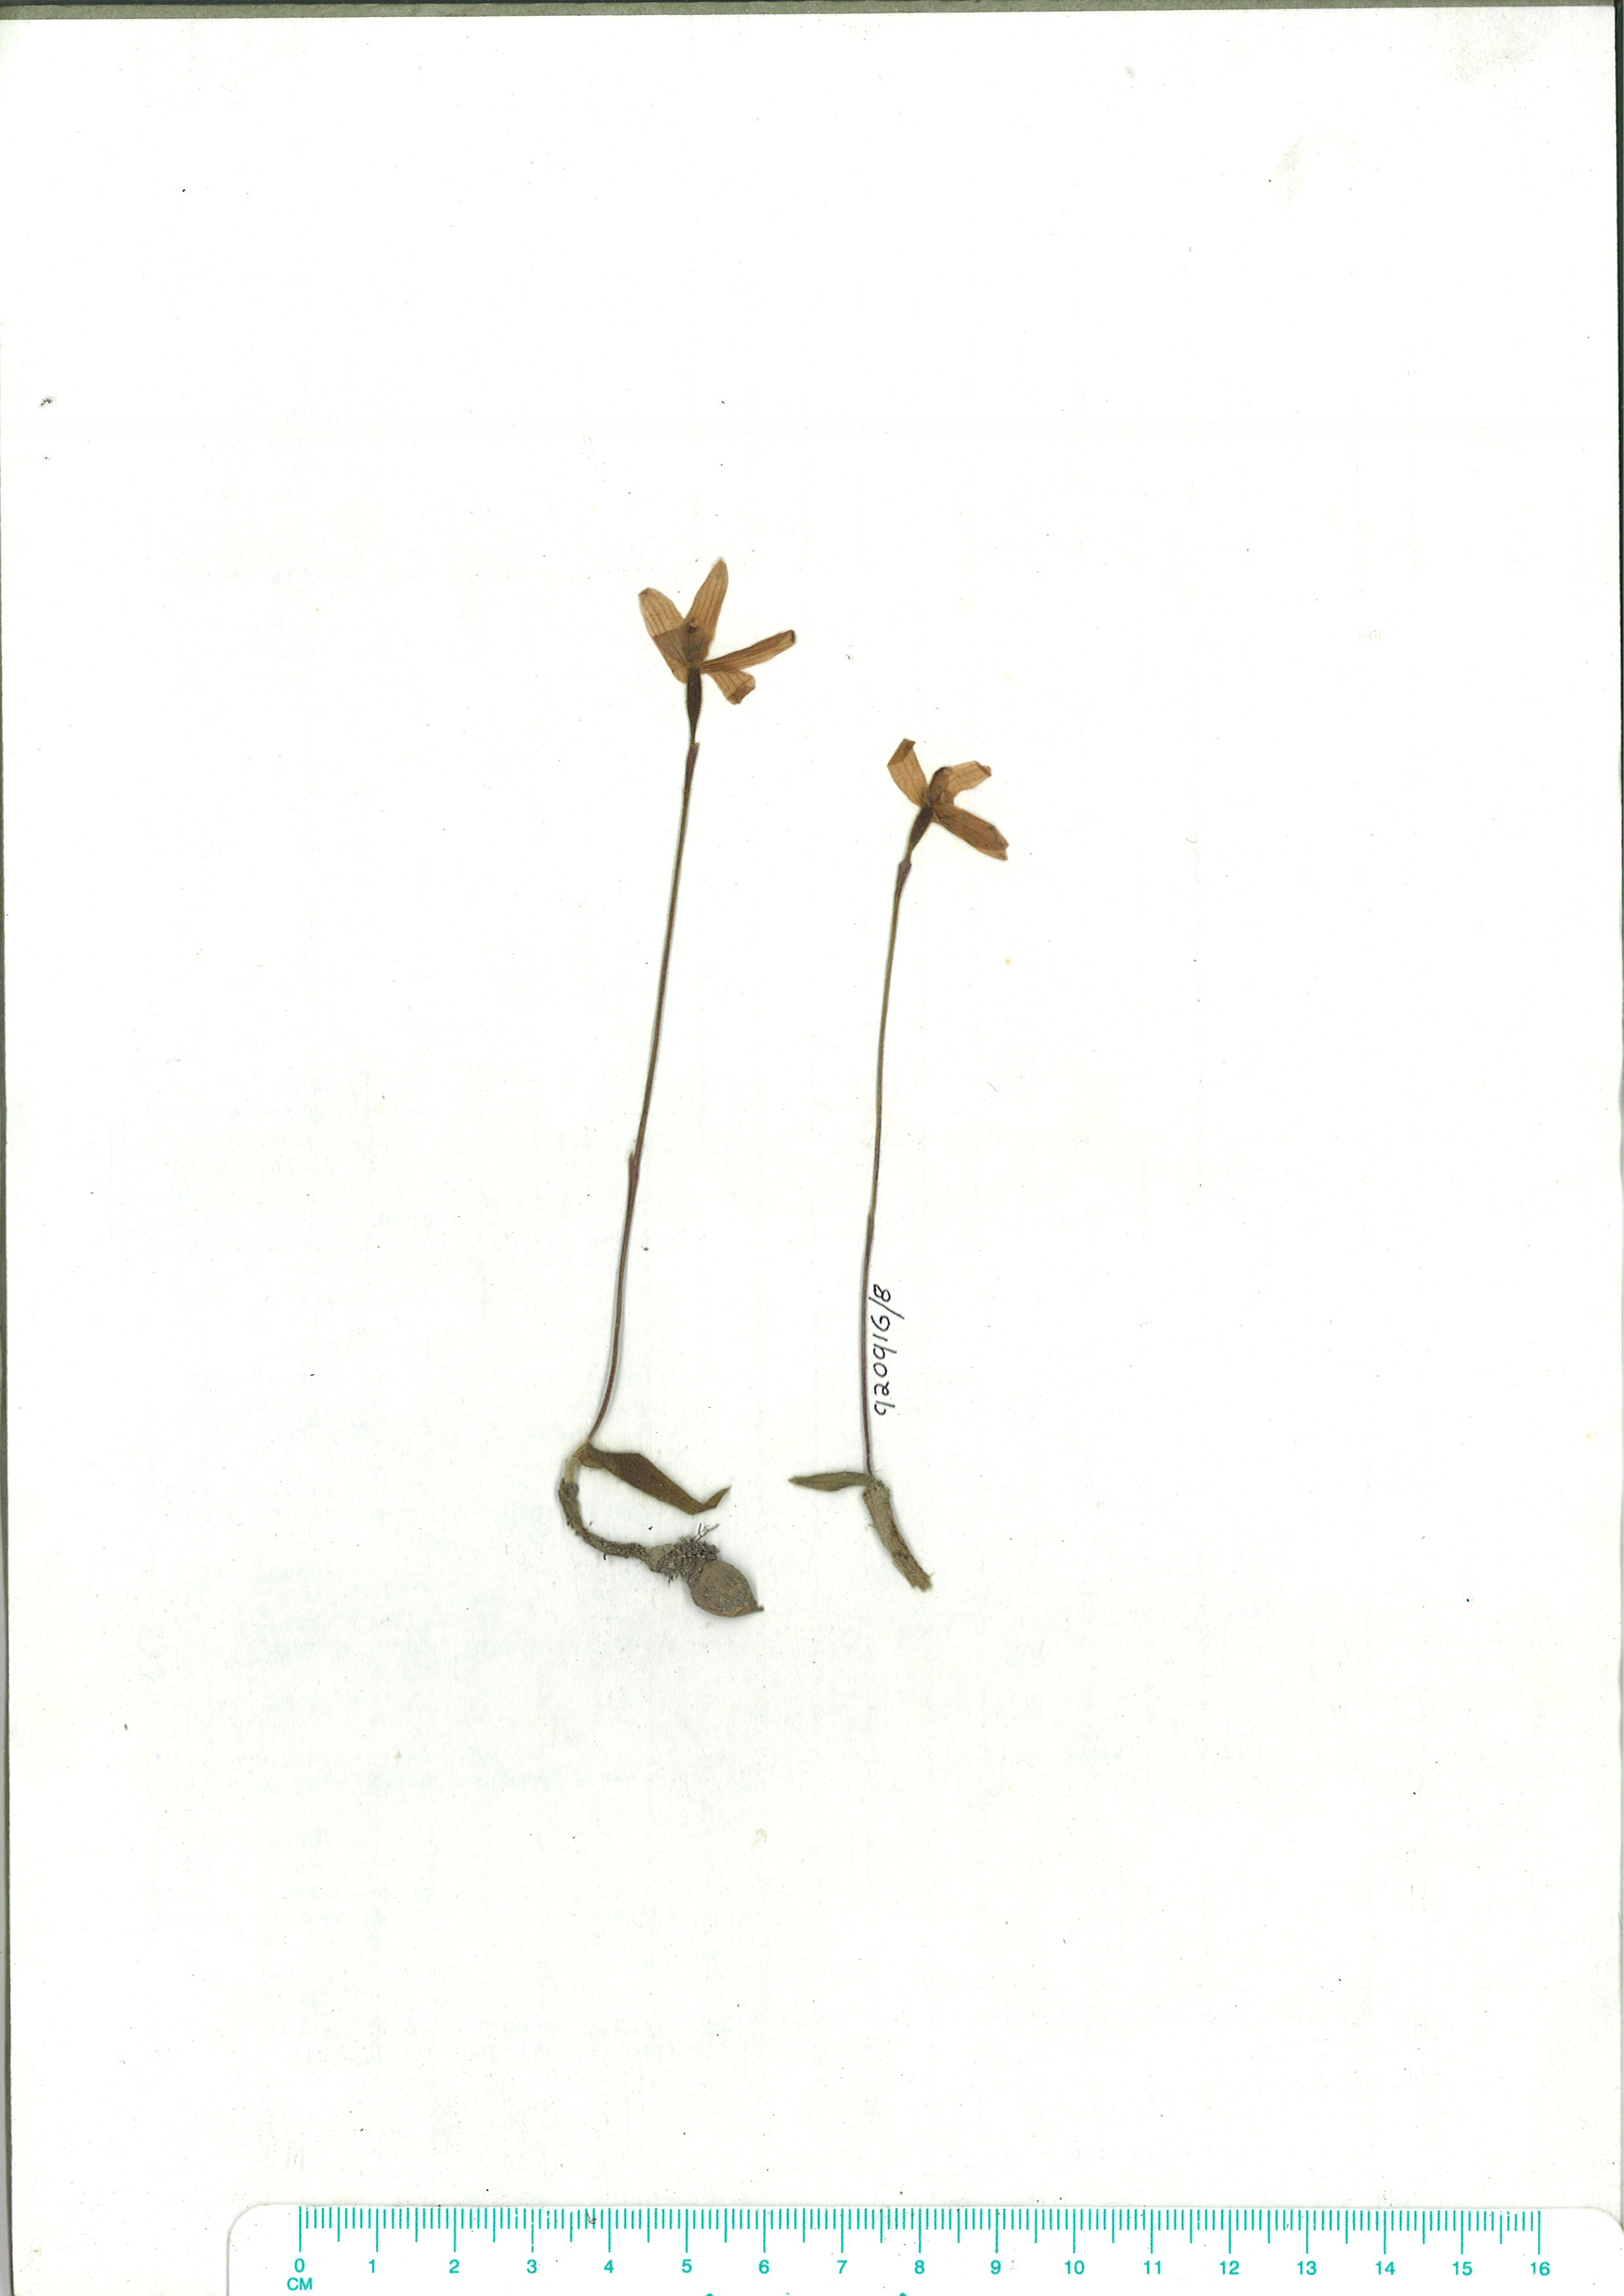 Scanned herbarium image of Glossodia minor